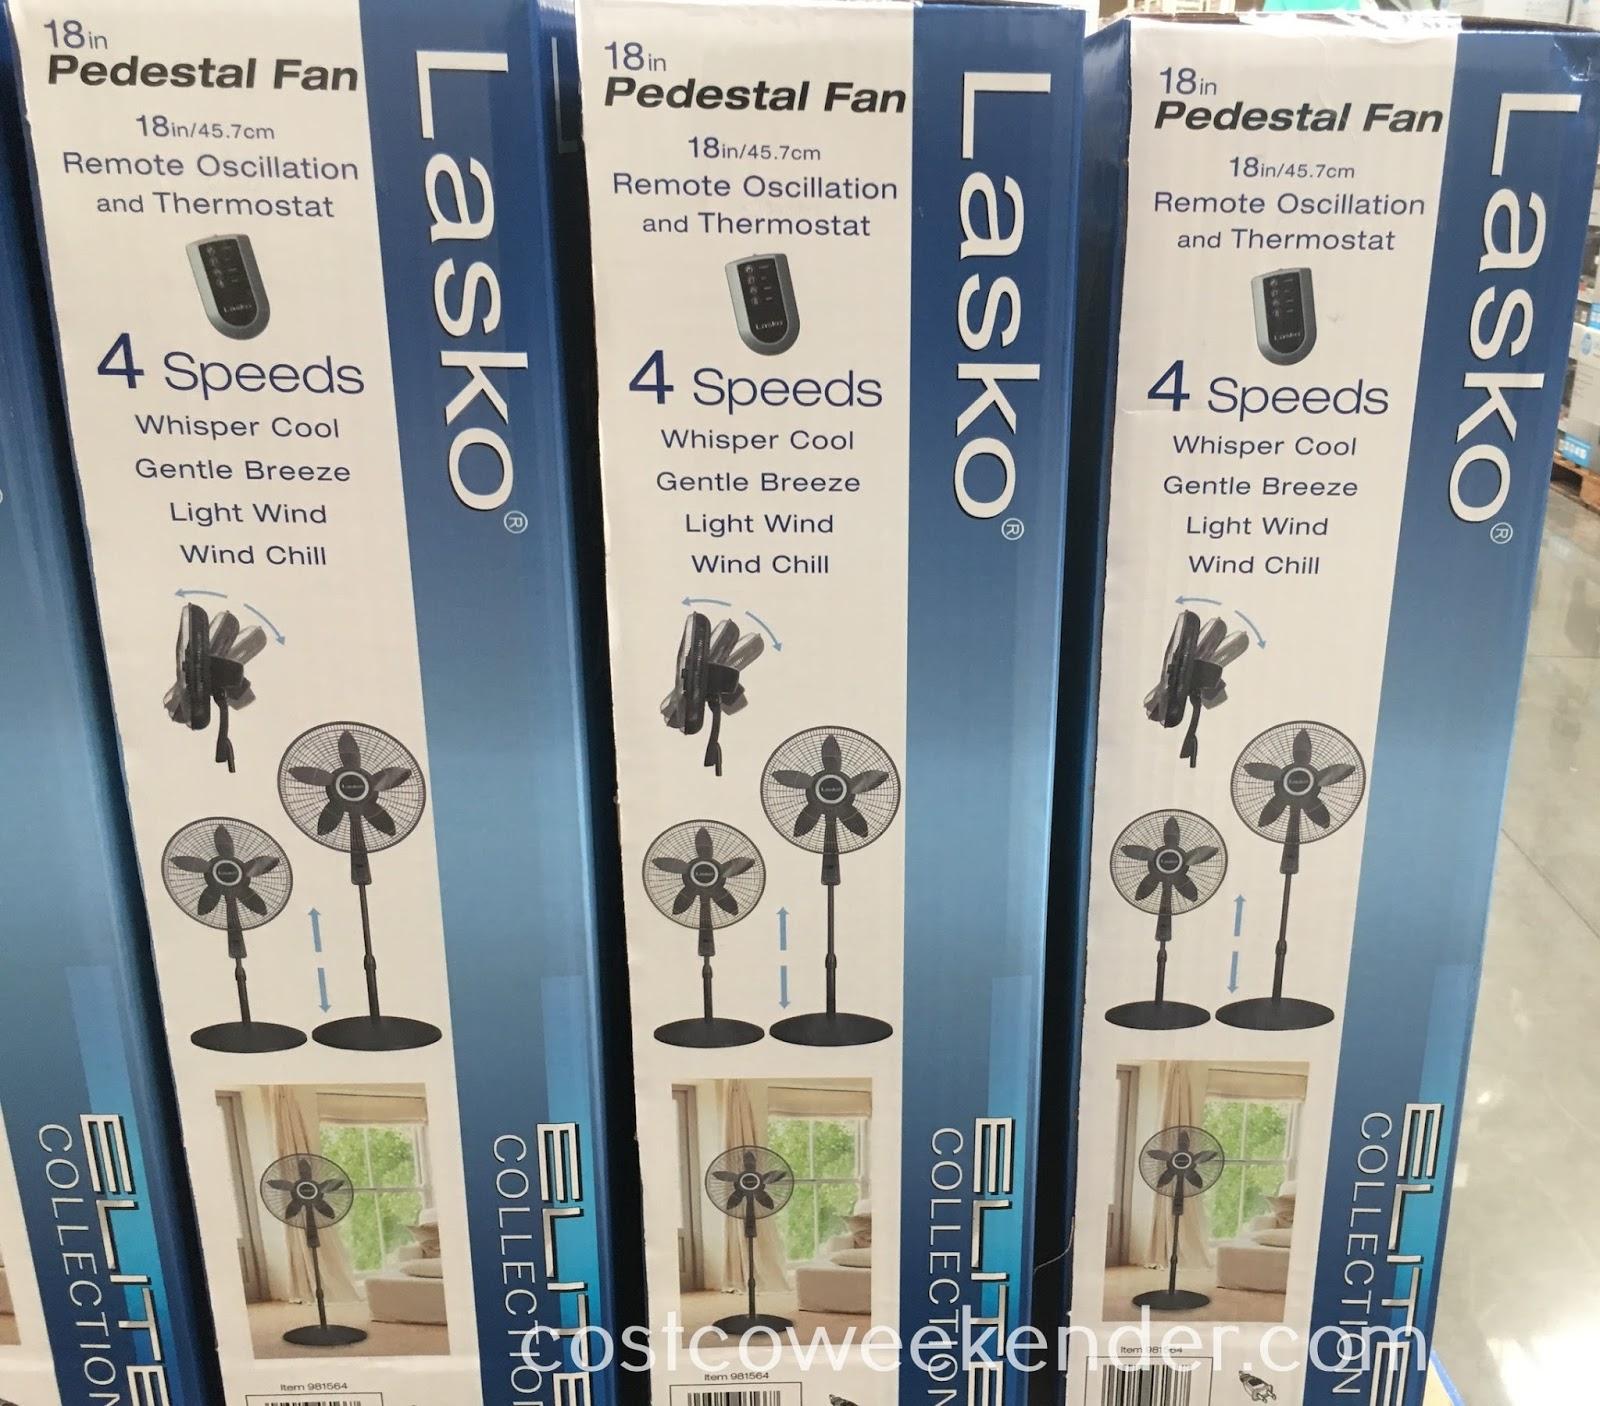 Costco 981564 - Lasko S18961 Elite Collection 18in Pedestal Fan: great for the summer heat